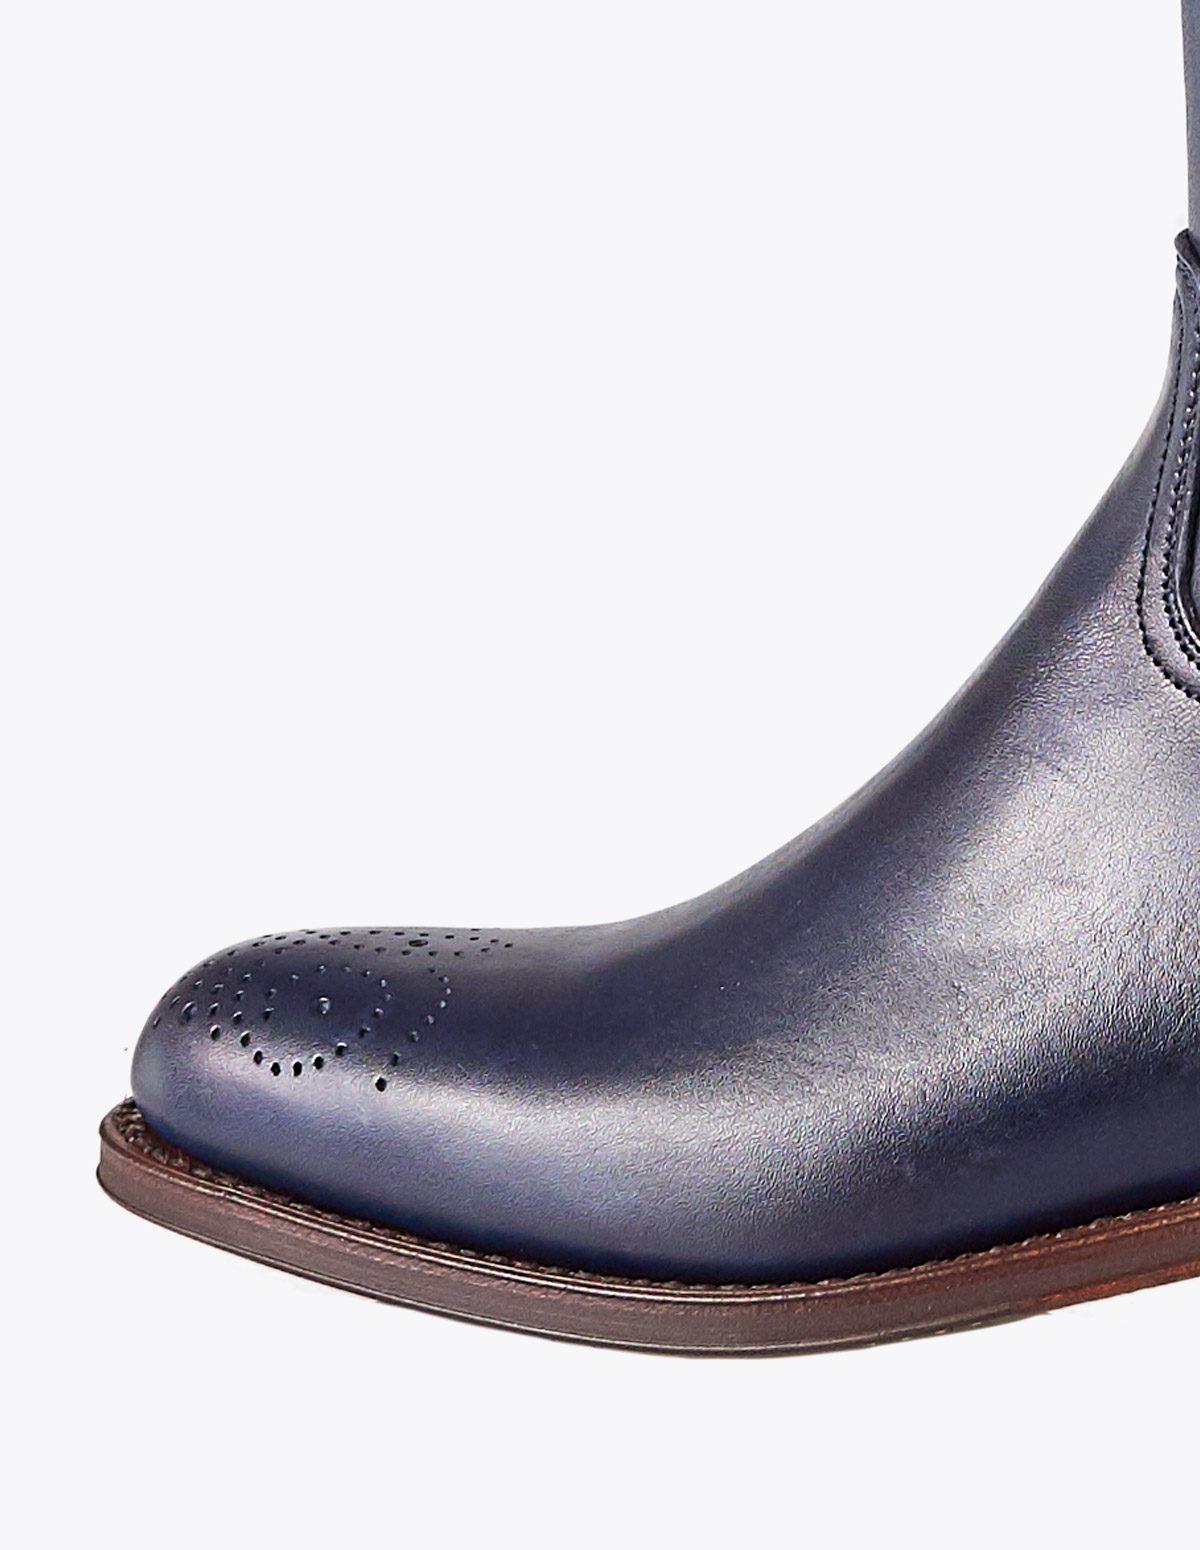 Bota Lady combi, tailor made shoes, schuhe nach mass en mandalashoes Santanyí Mallorca